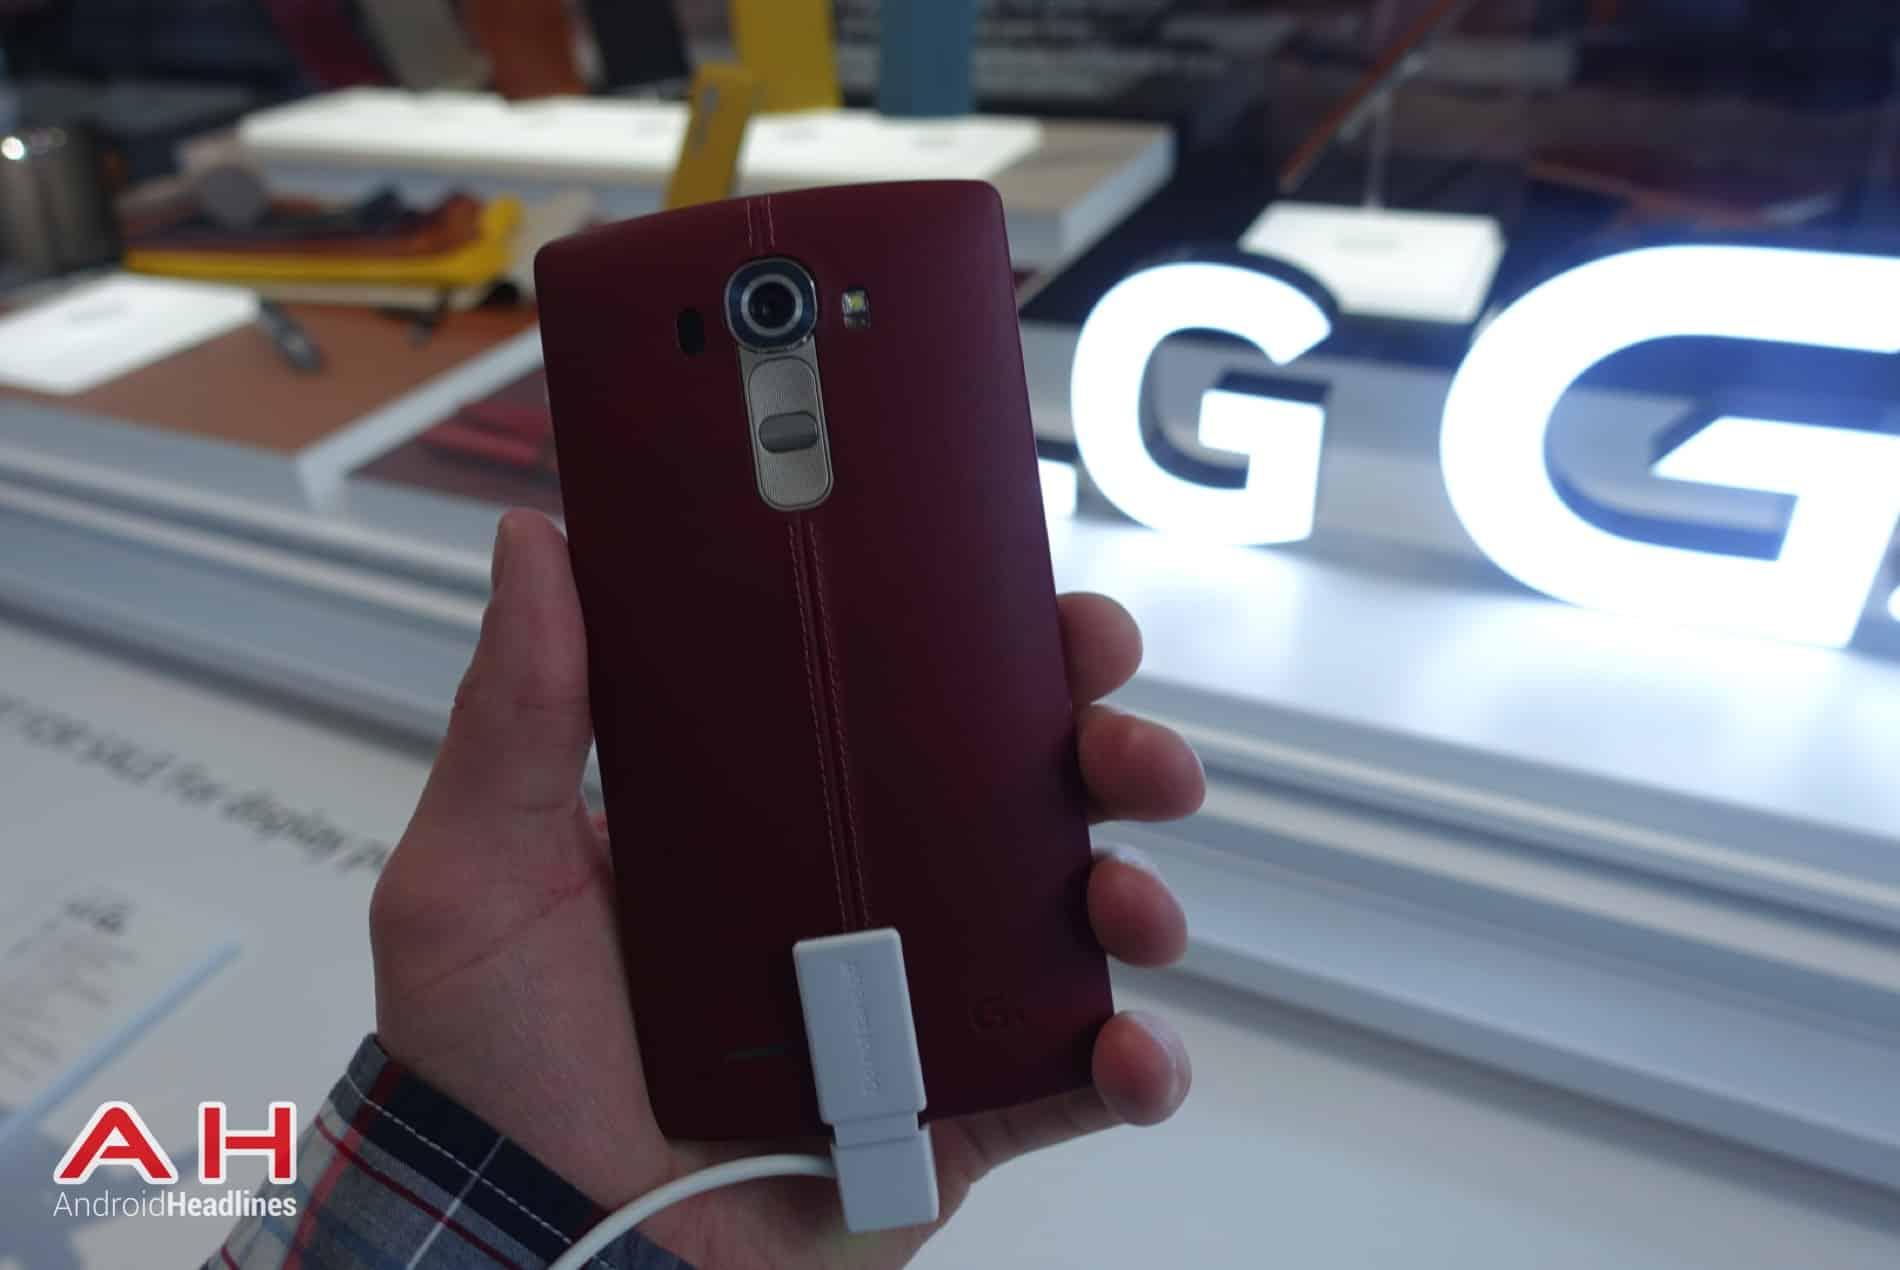 LG G4 AH 03